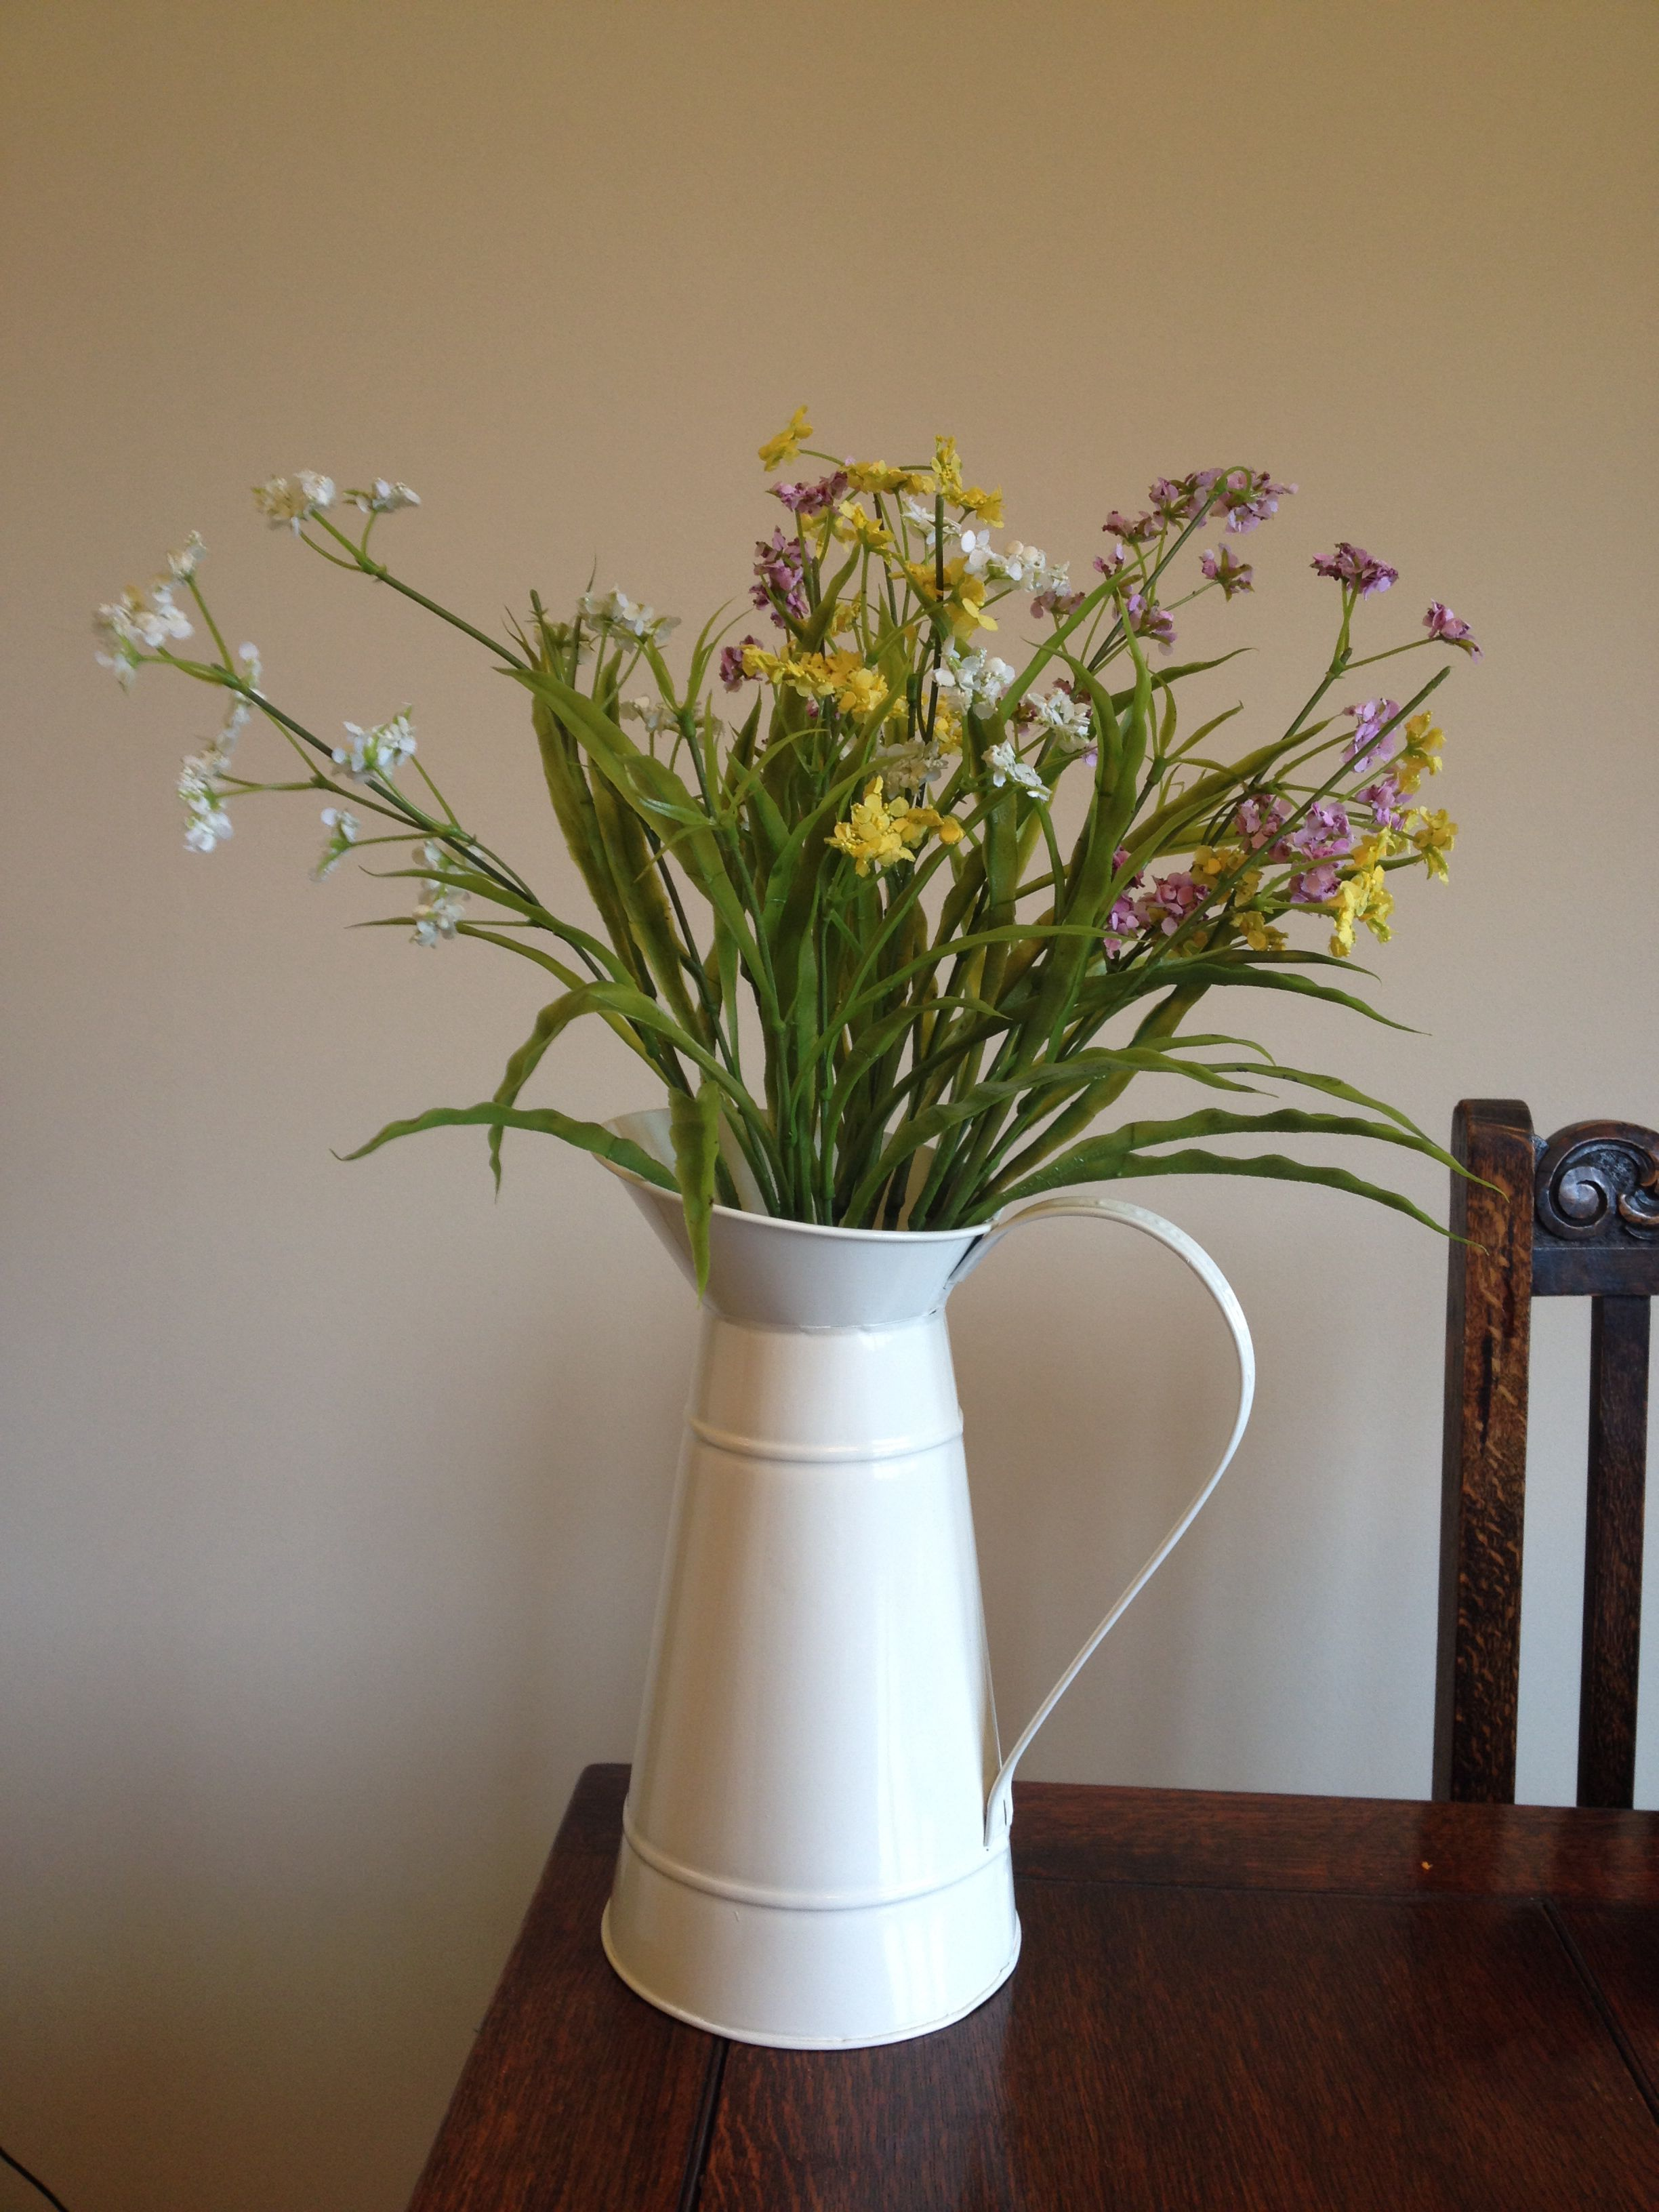 Jug of Flowers from Sainsburys   Living Room   Pinterest ... Flower Vase Sainsburys on taylor flowers, reed flowers, tesco flowers, sharp flowers, amazon flowers, clarke flowers, ikea flowers, monsoon flowers,